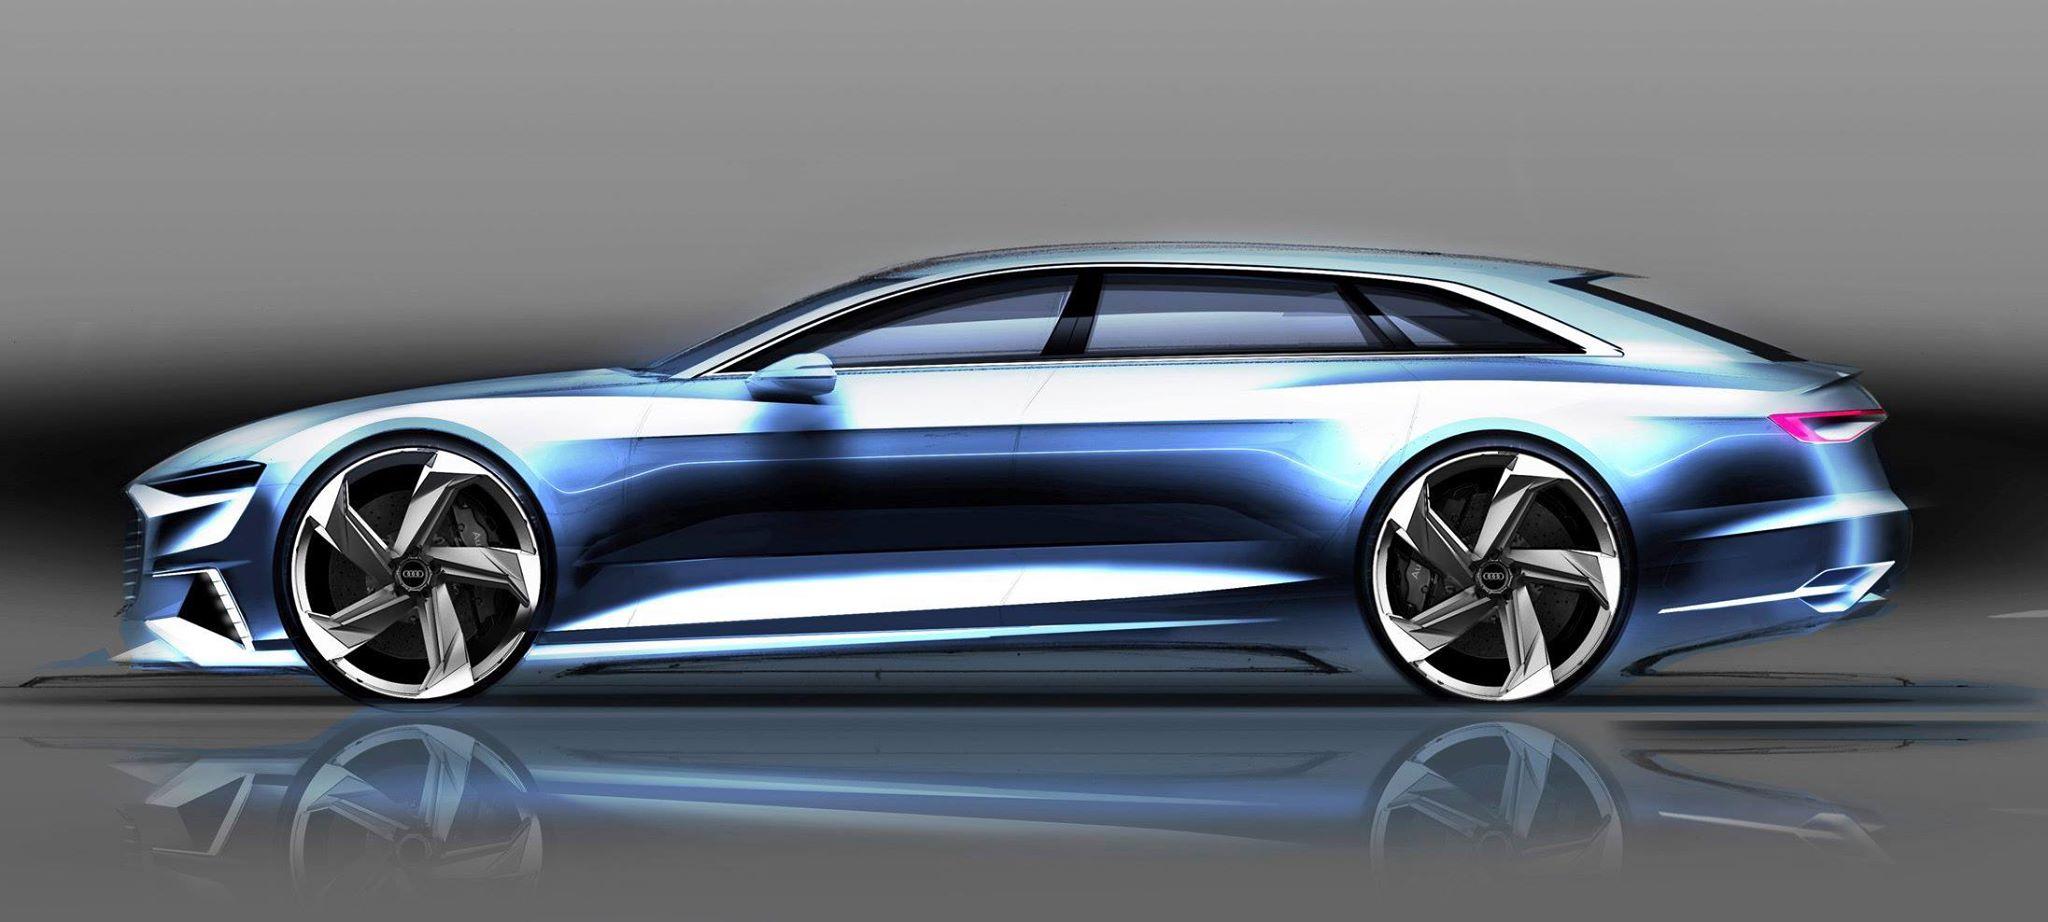 Audi Prologue A... Audi Concept Cars 2015